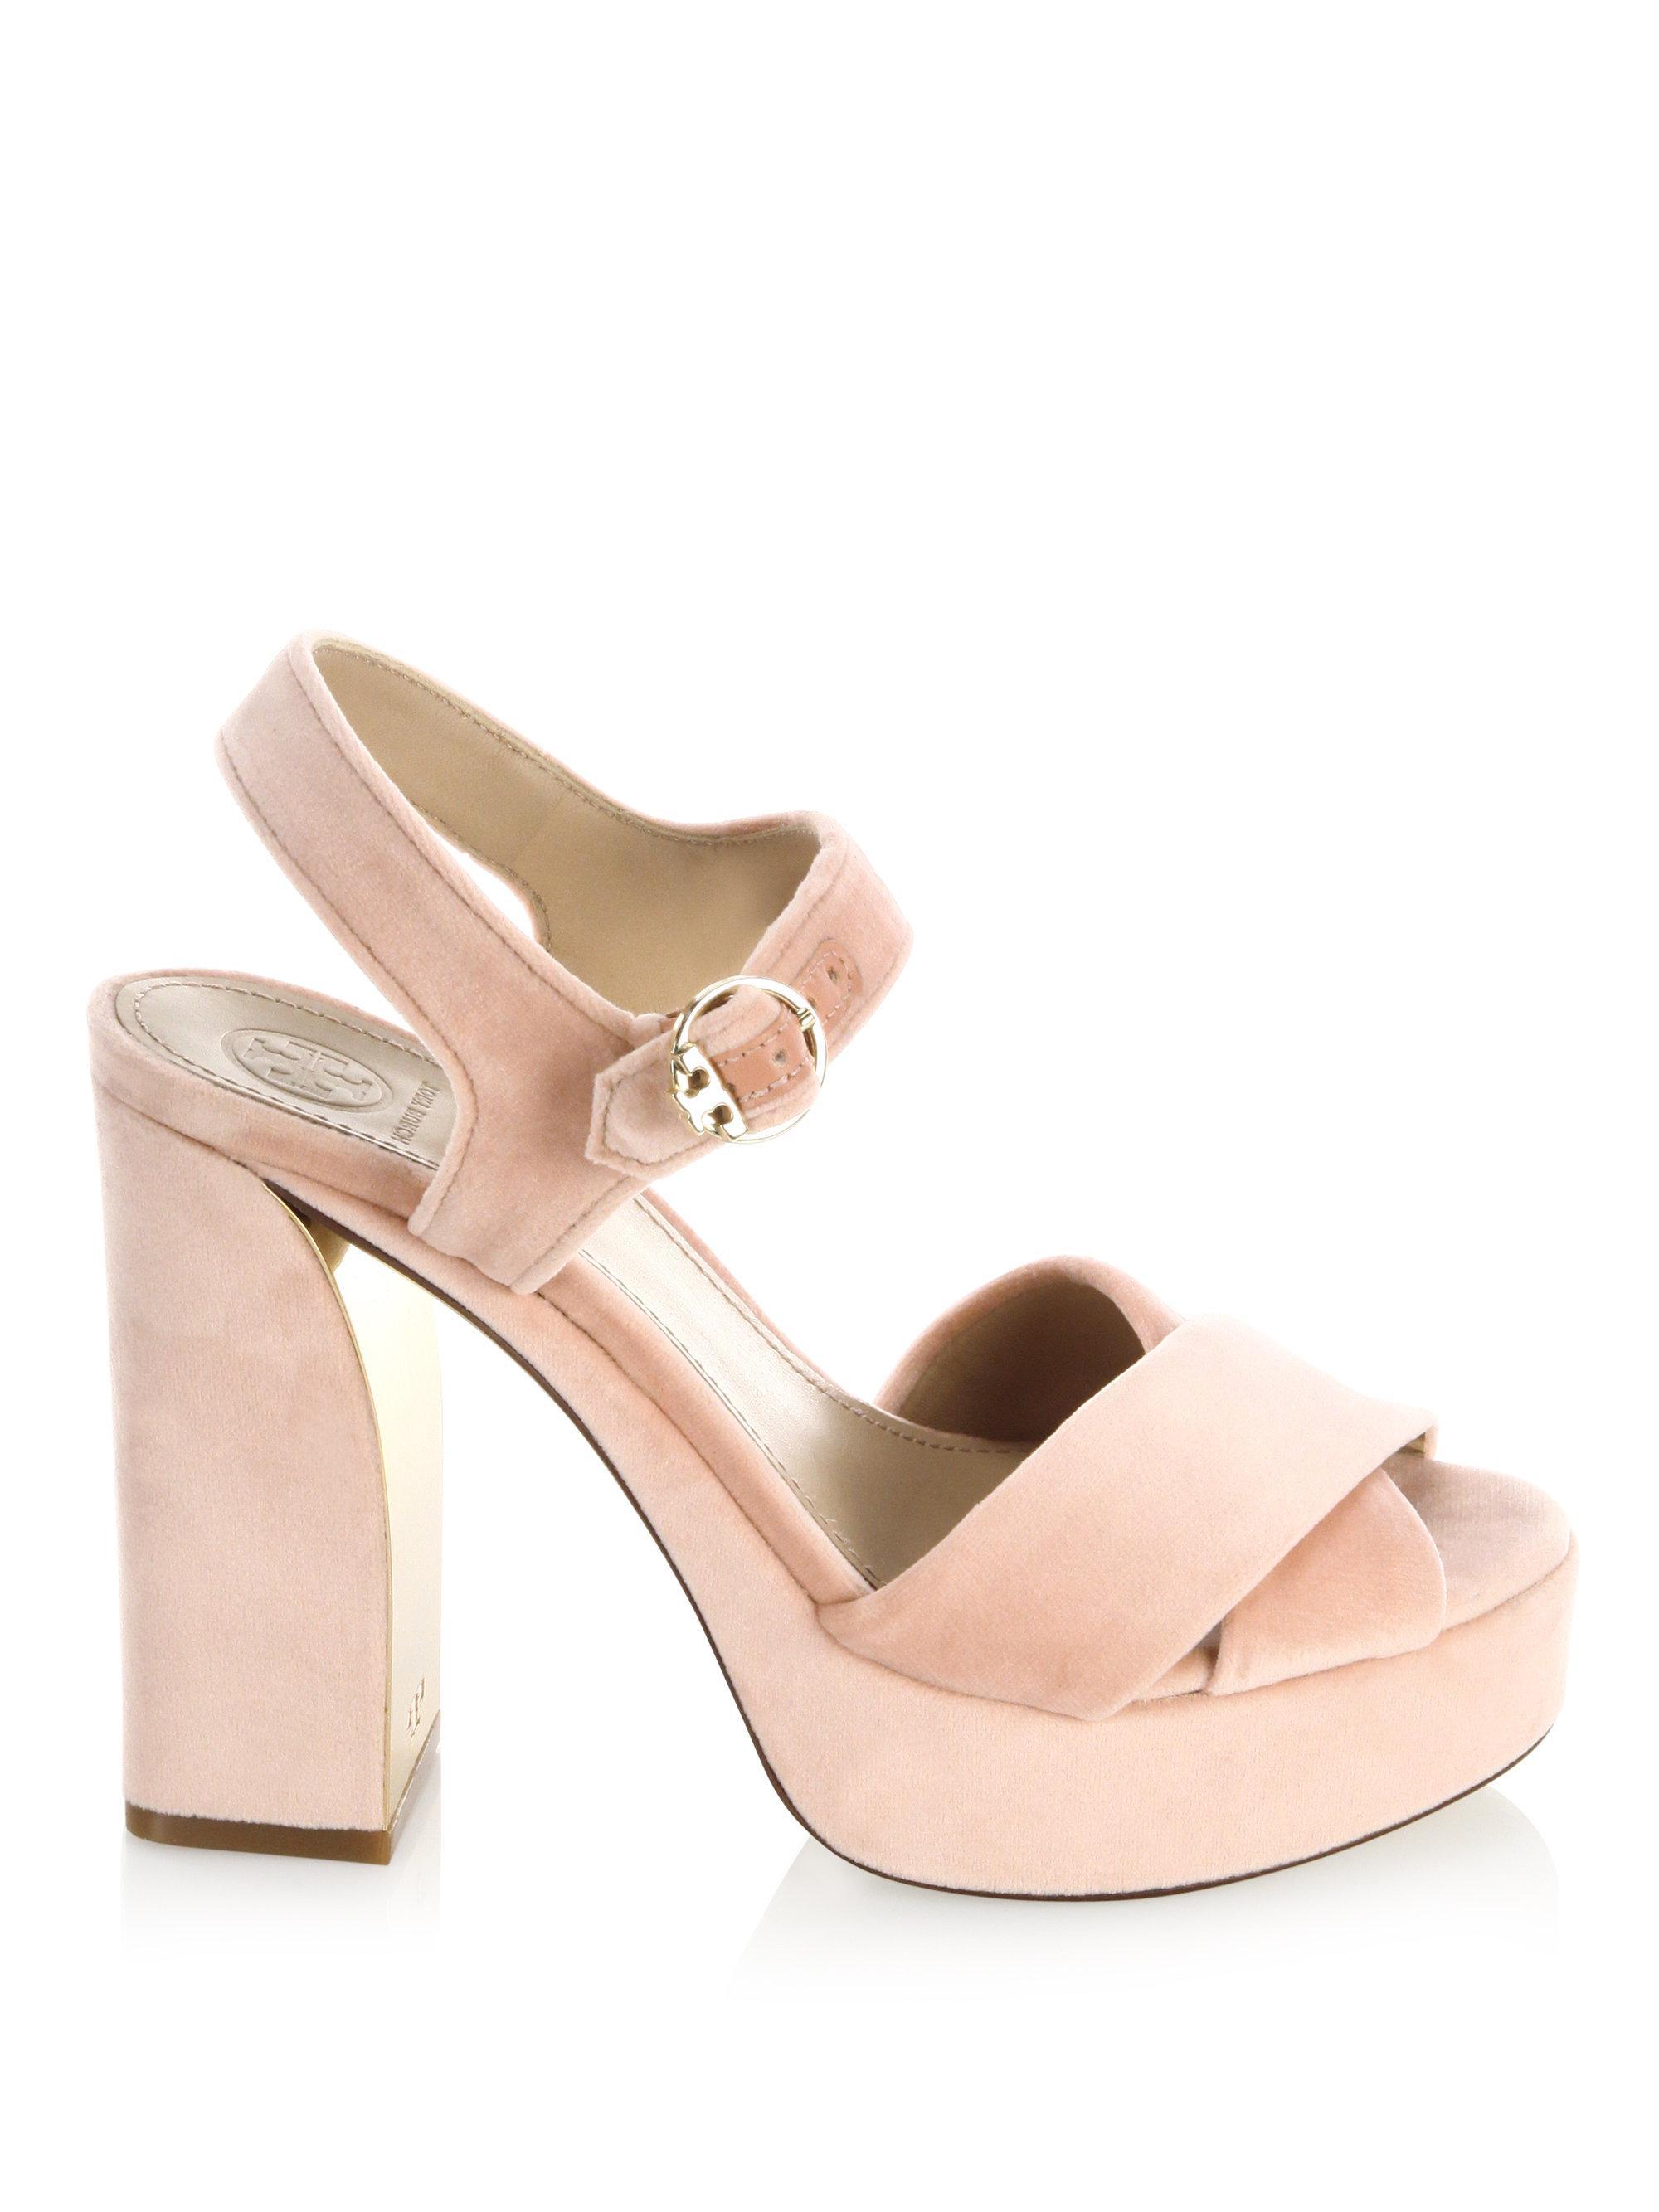 cc7b3376e60 Lyst - Tory Burch Loretta Velvet Platform Sandal in Pink